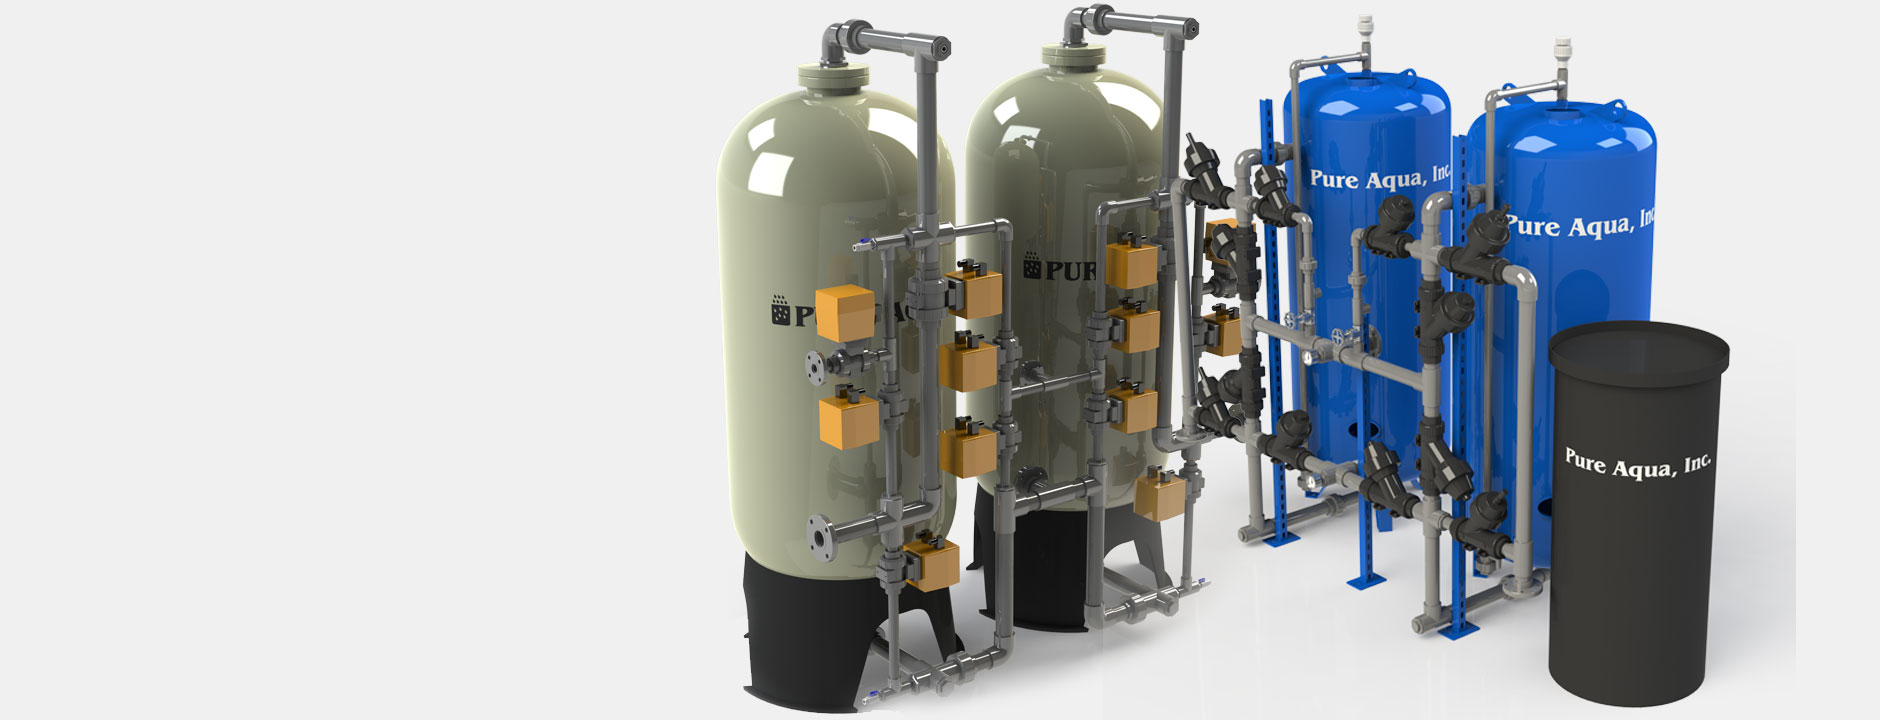 ion exchange, water softeners systems أنظمة التبادل الأيونى لمعالجة المياة